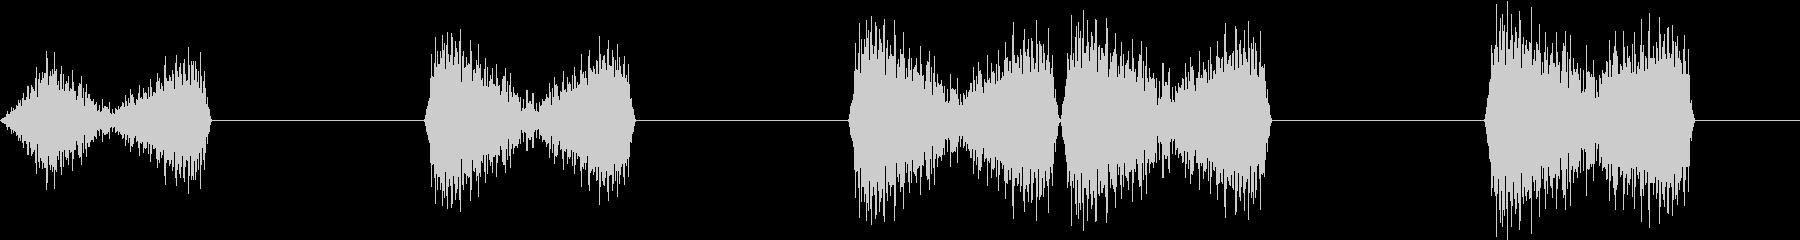 DJプレイ スクラッチ・ノイズ 7 煽りの未再生の波形